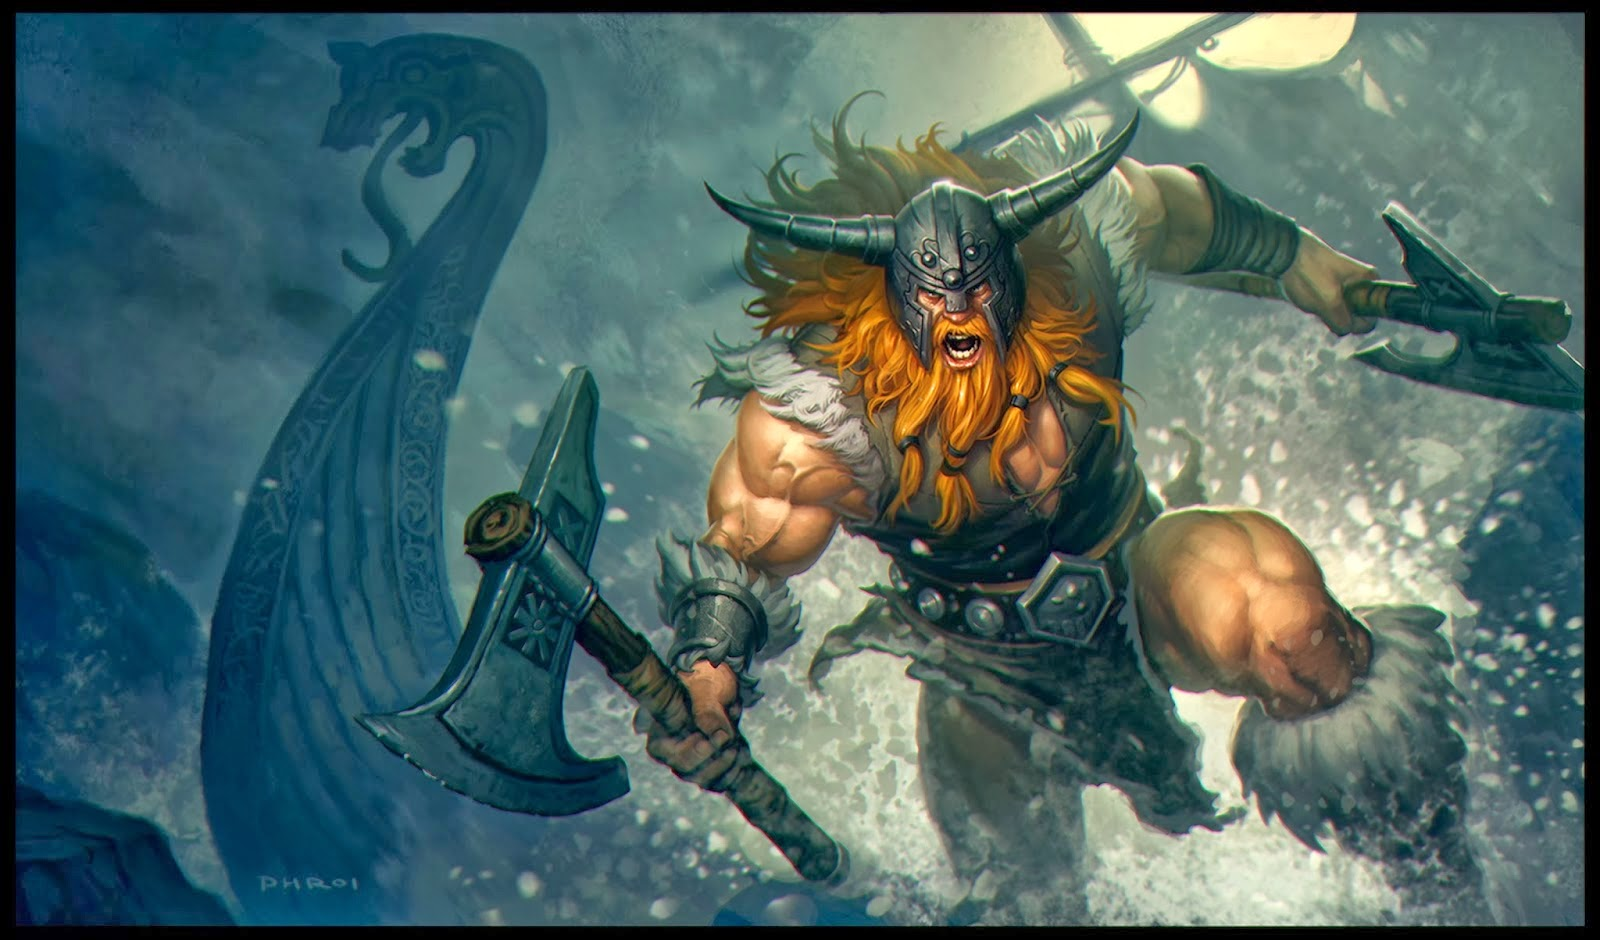 Olaf League of Legends Wallpaper Olaf Desktop Wallpaper 1600x940